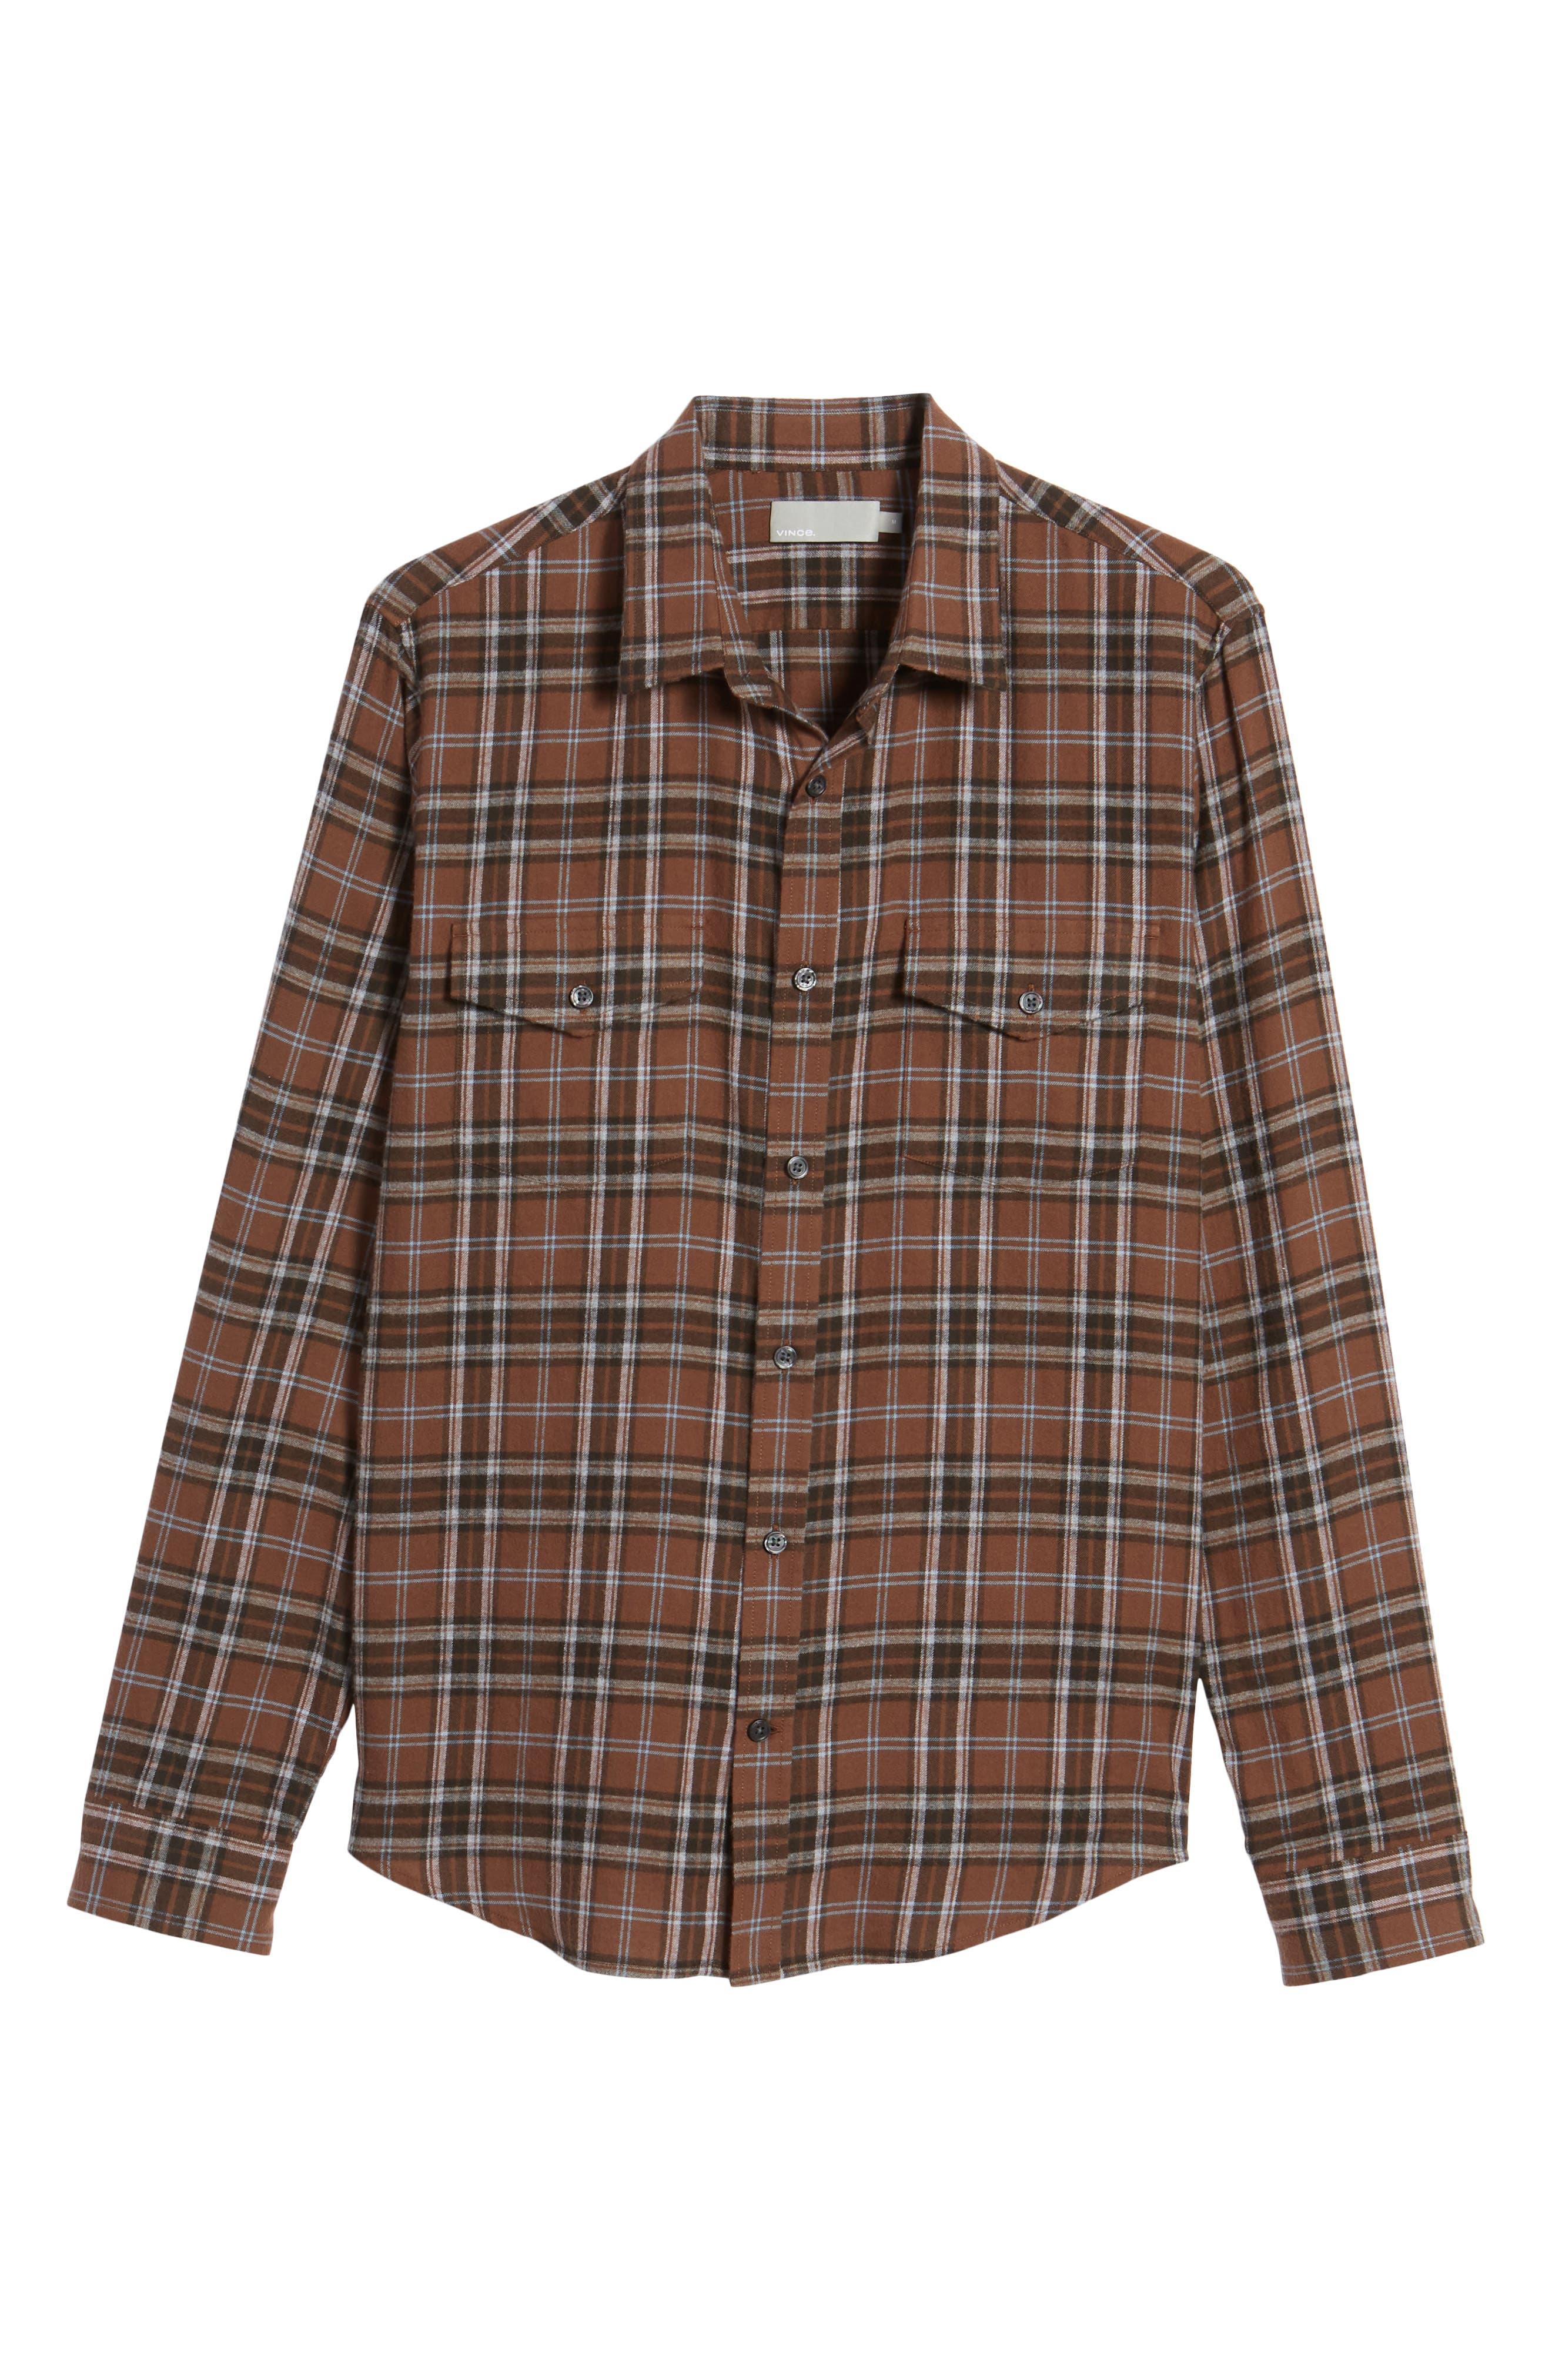 Regular Fit Plaid Sport Shirt,                             Alternate thumbnail 7, color,                             Dark Henna